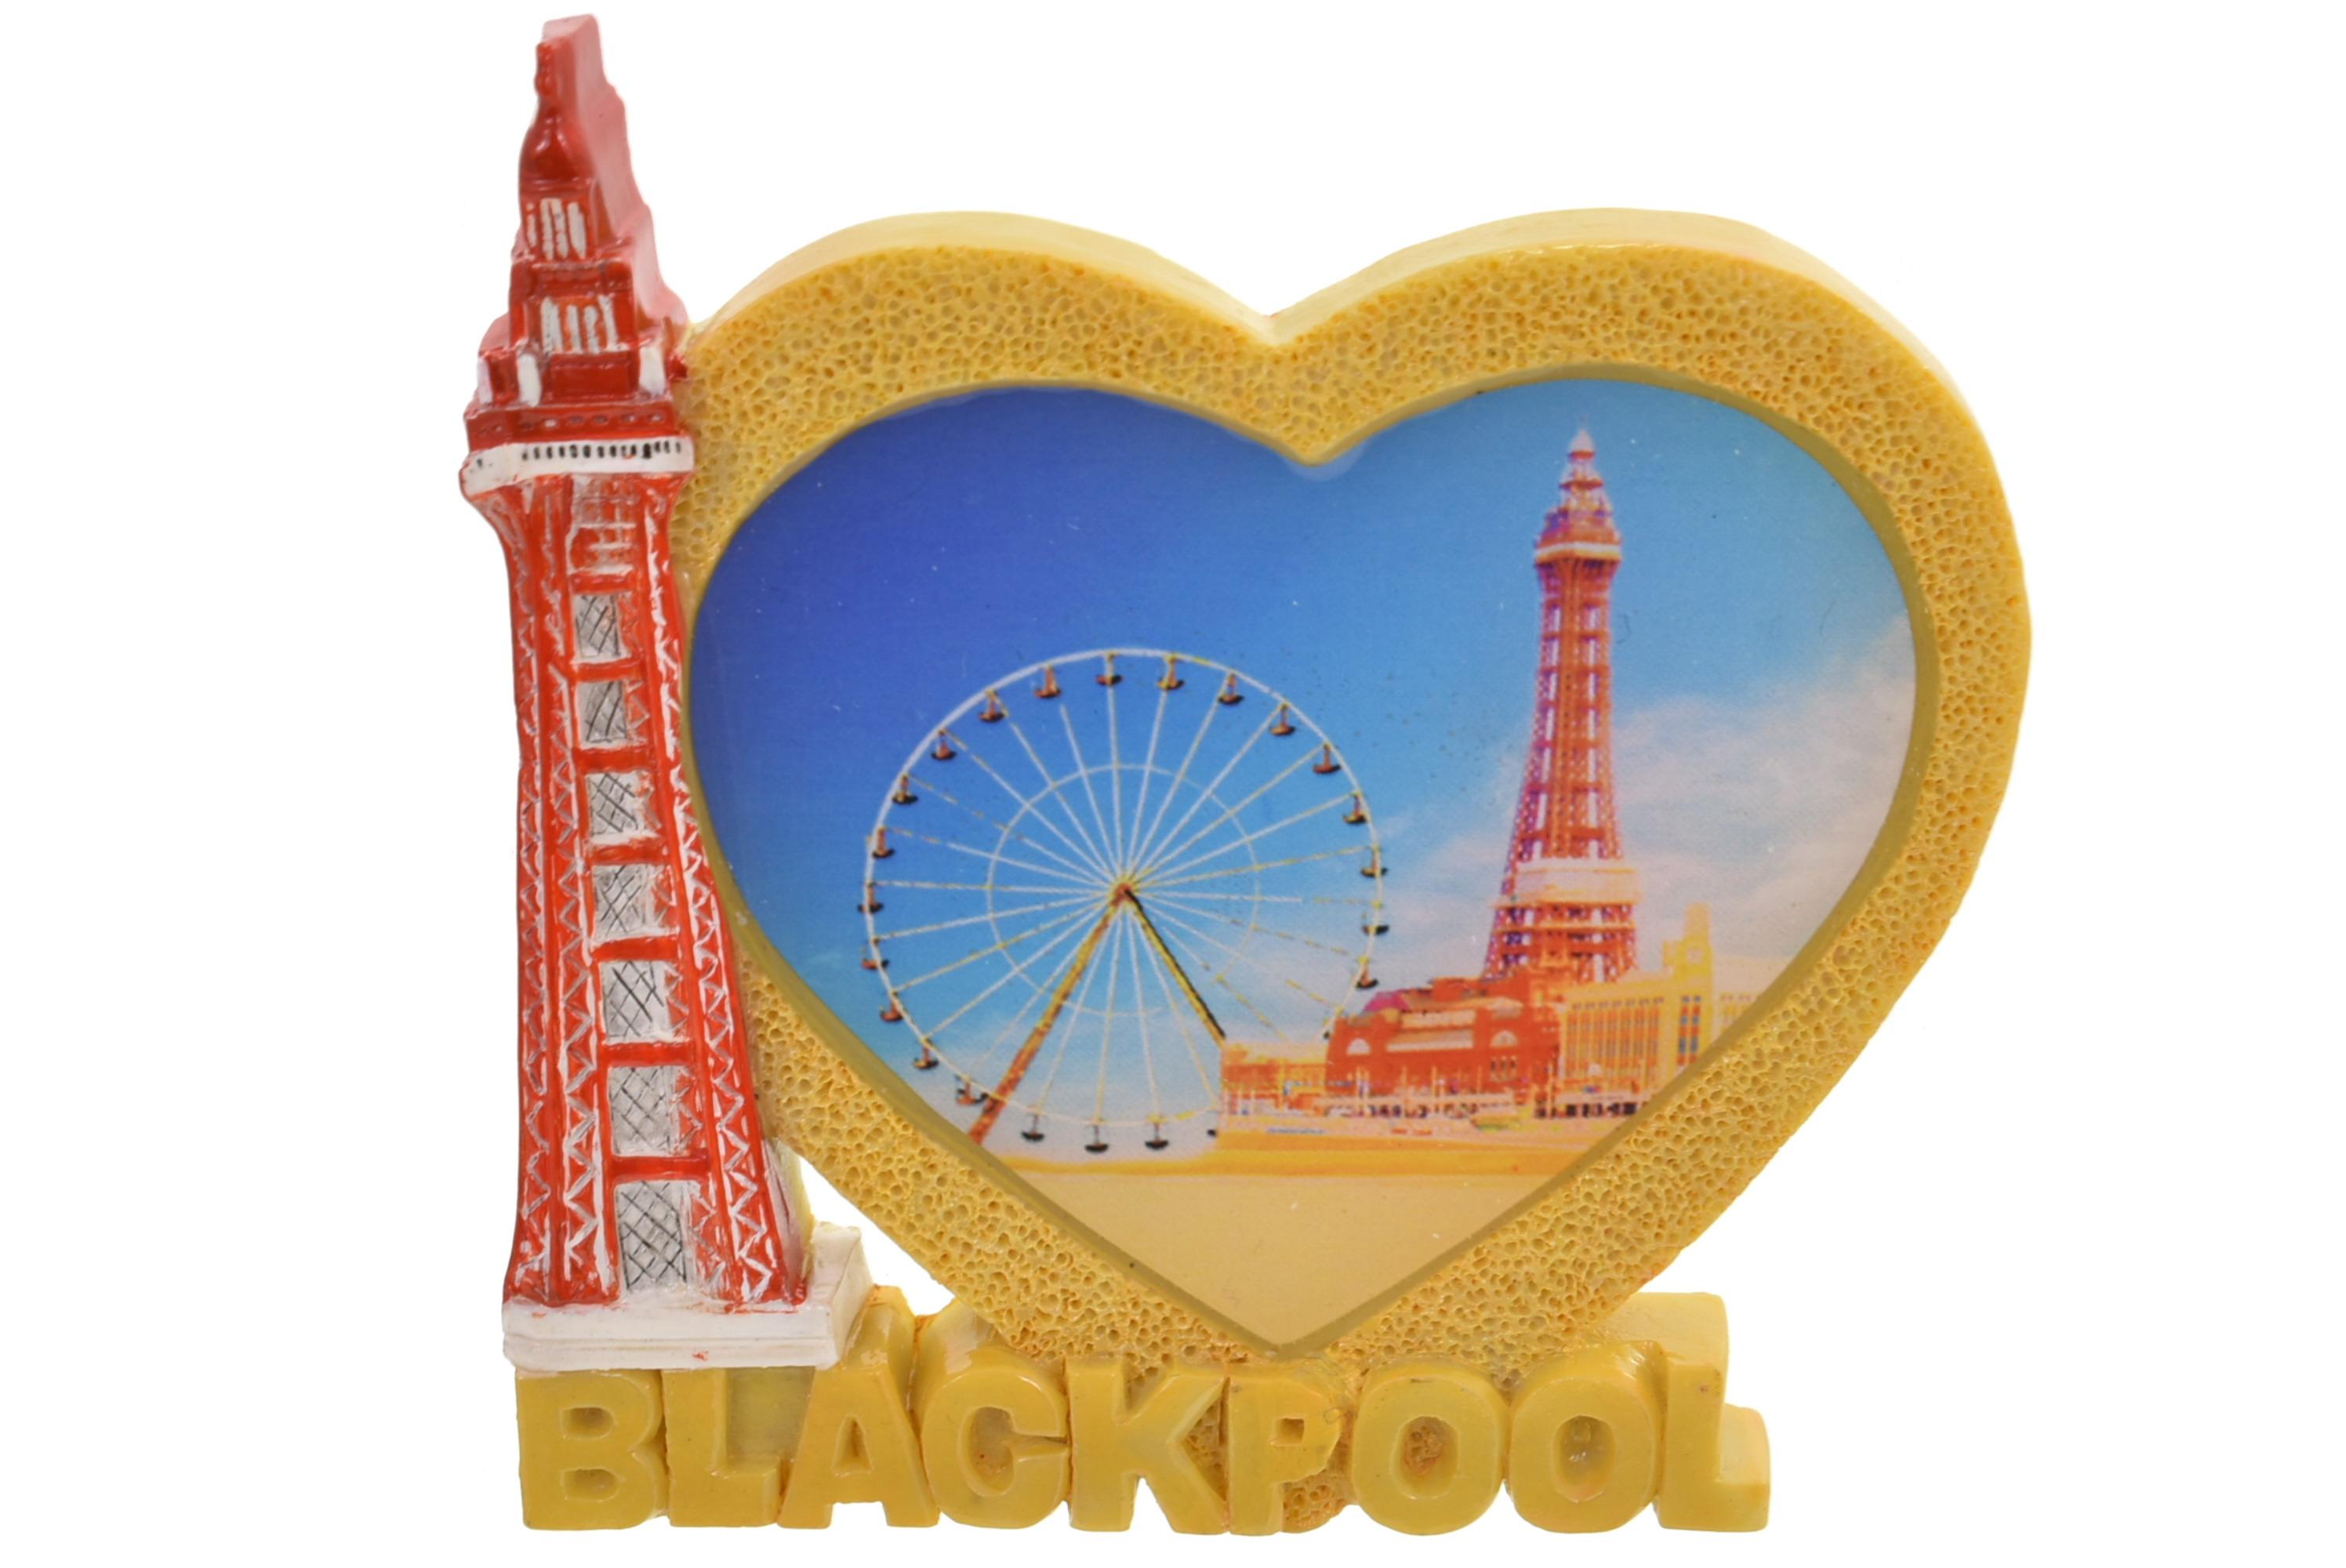 Blackpool Heart Tower Wheel Magnet